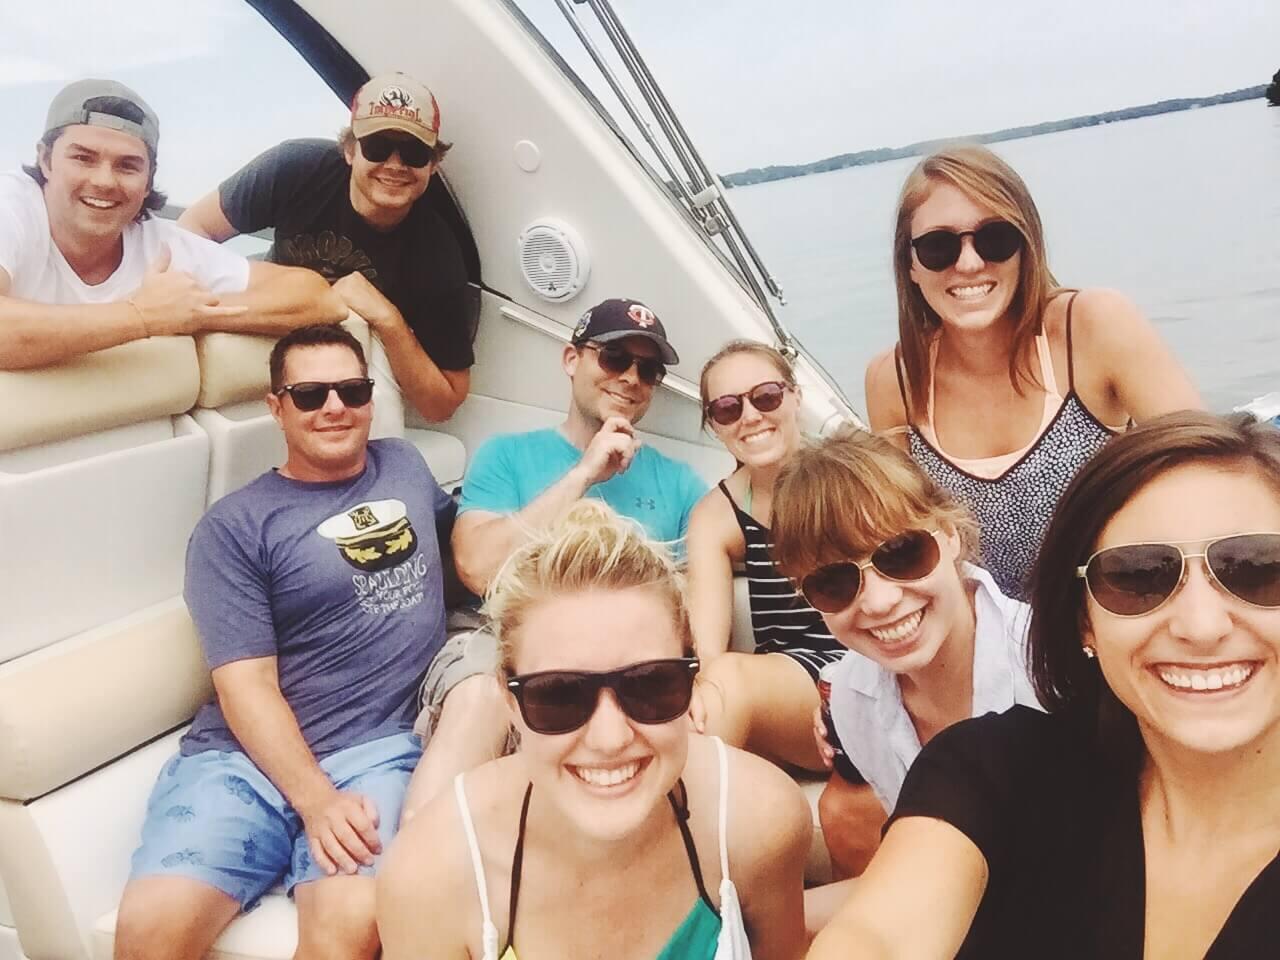 NordicClick staff boating on Lake Minnetonka